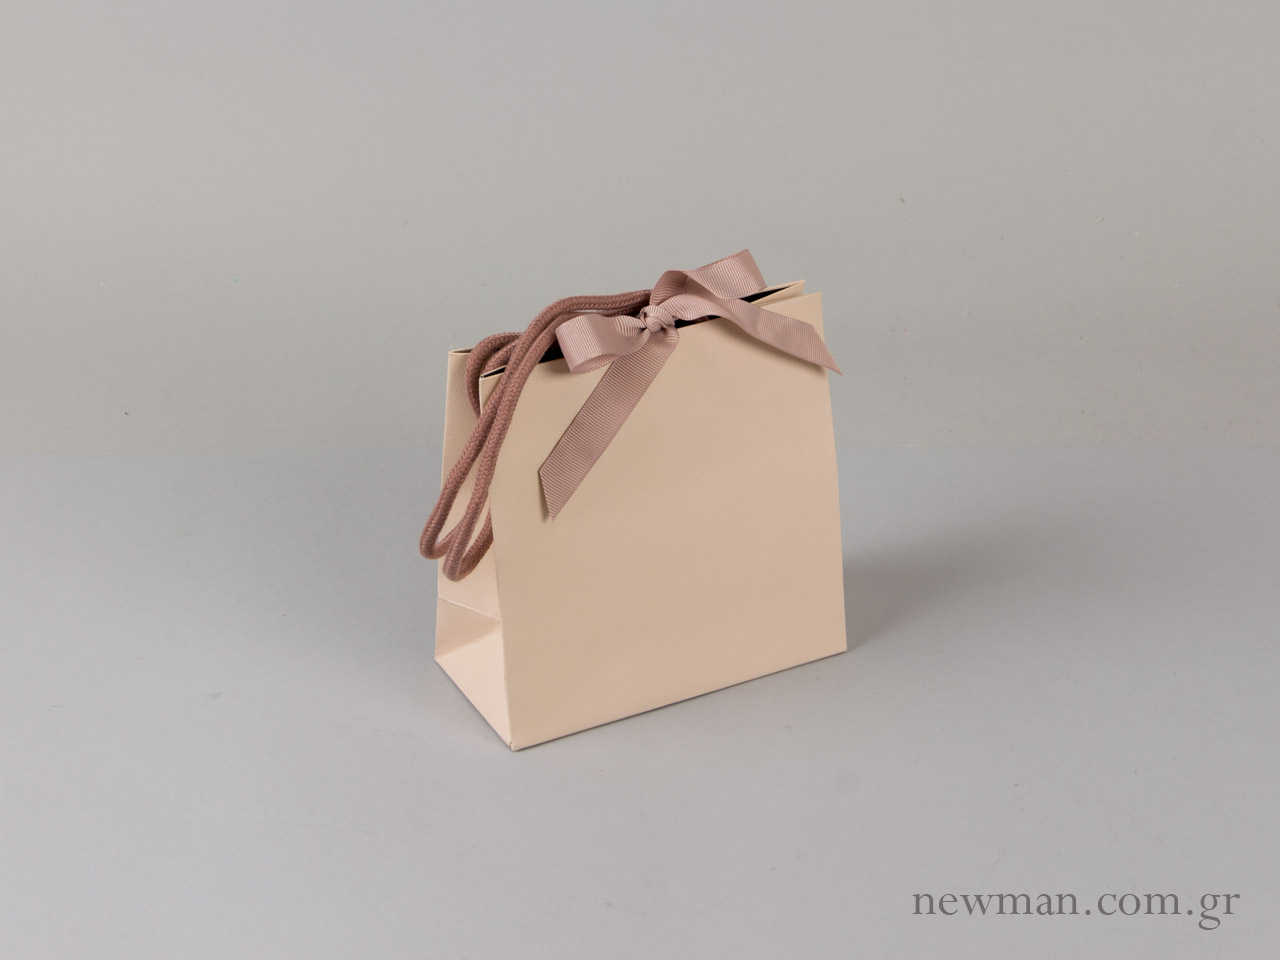 4fbb94fb0d Τσάντα πολυτελείας με κορδόνι και κορδέλα tsanta kordoni gro 064101